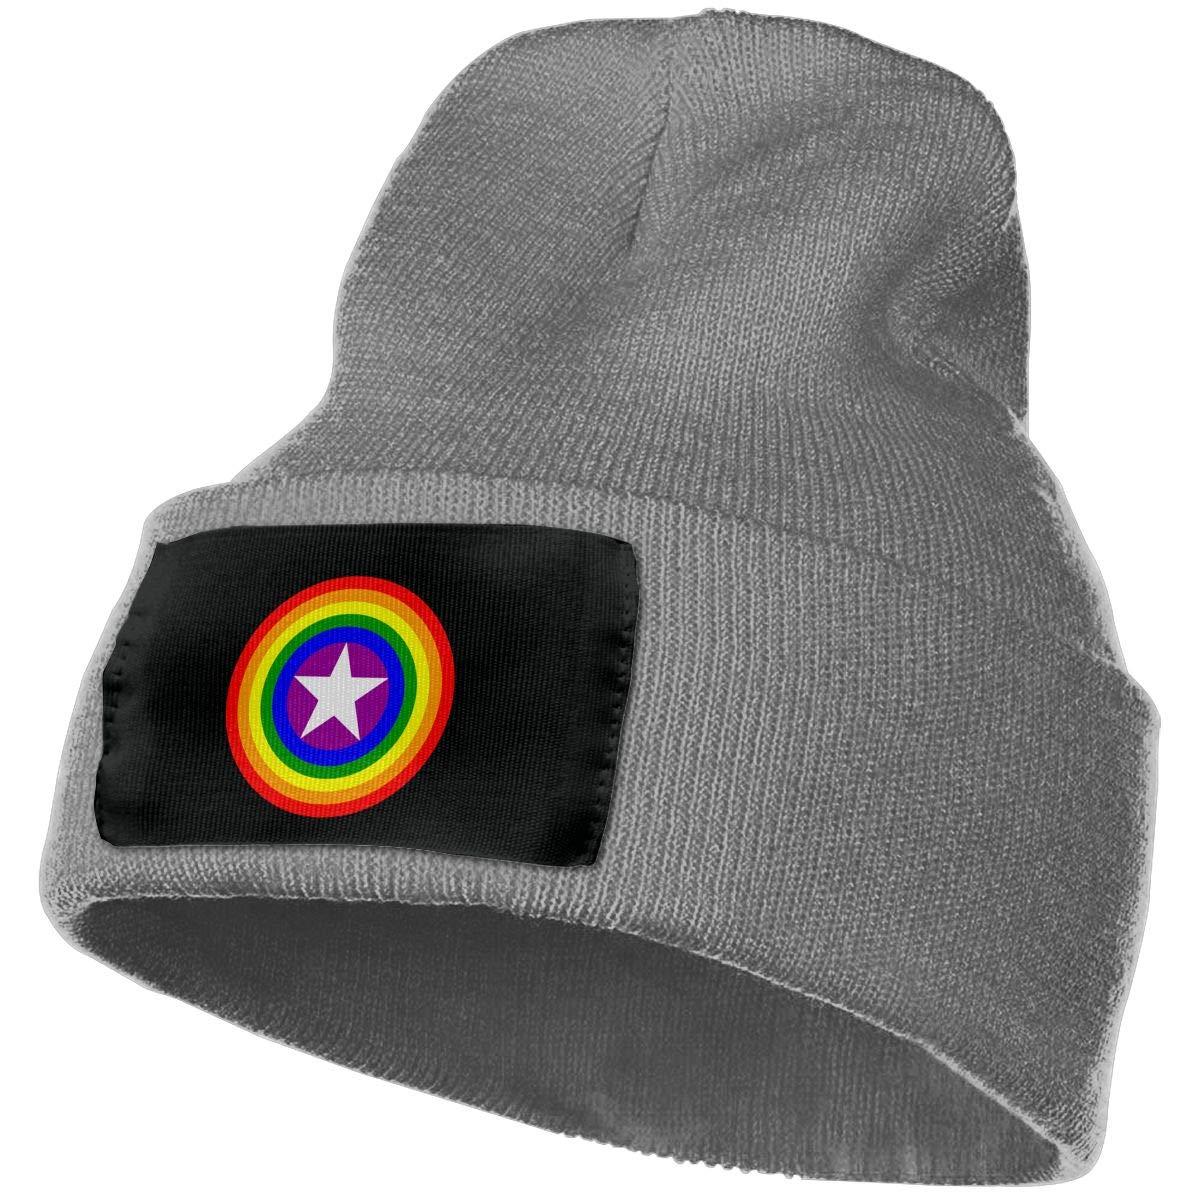 Zml0pping Pride Shields Unisex Cap